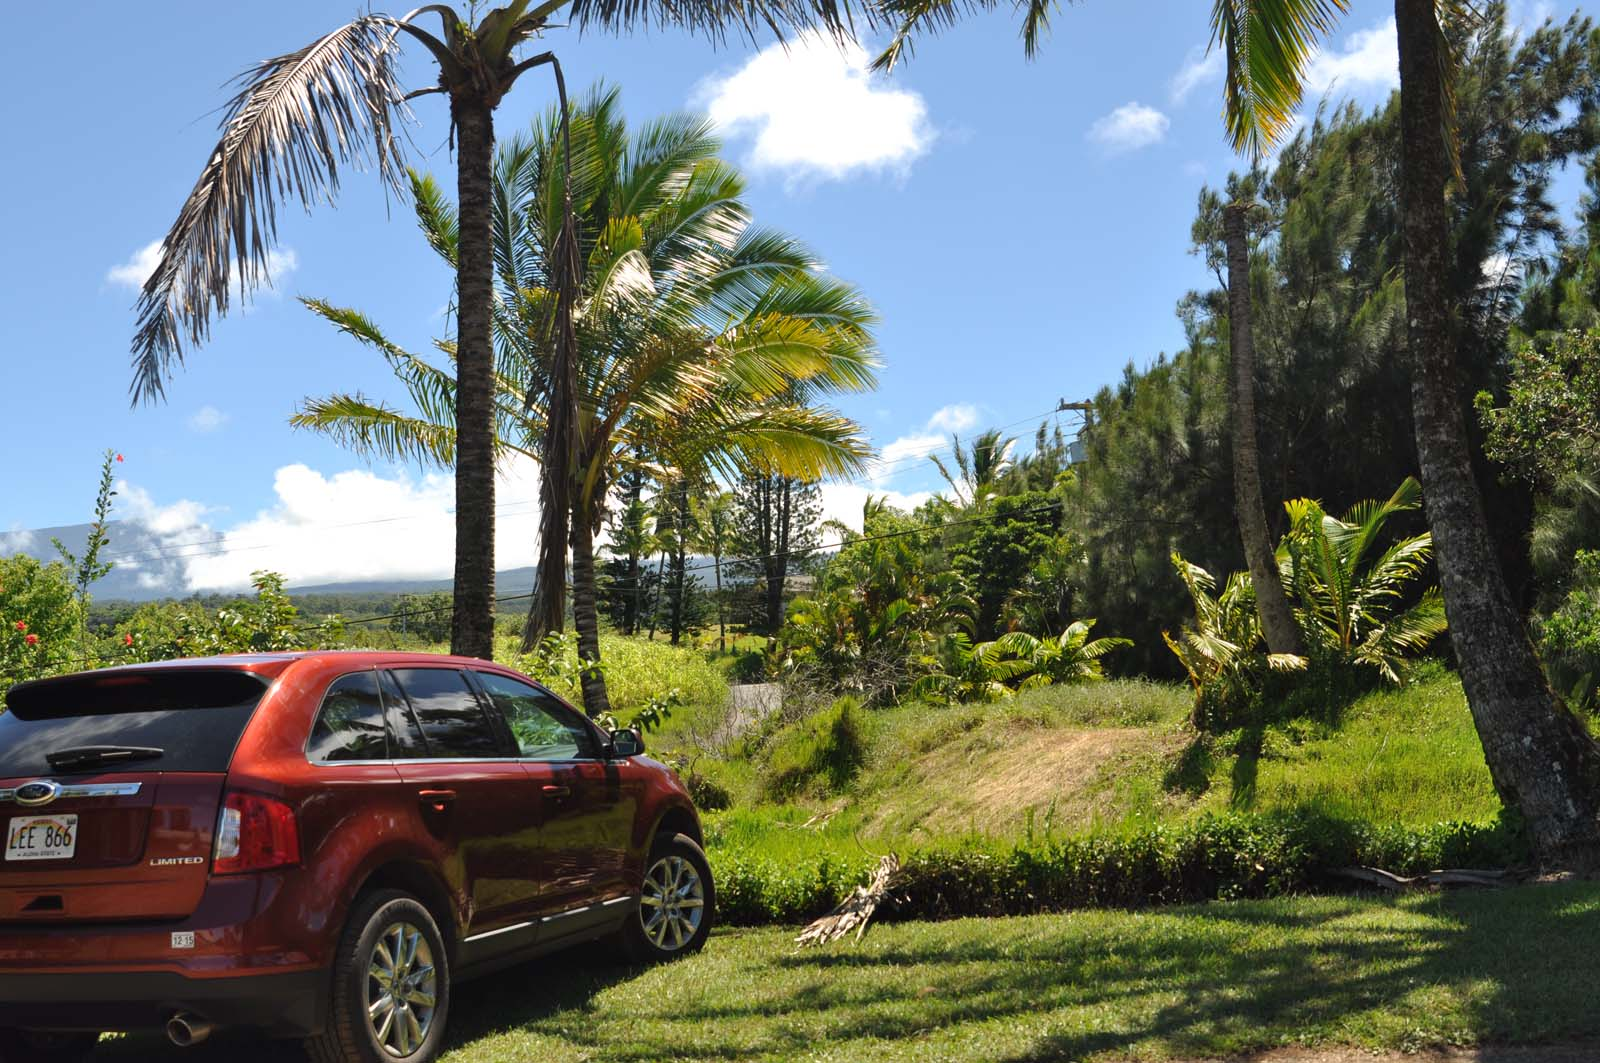 045_maui_hawaii_island